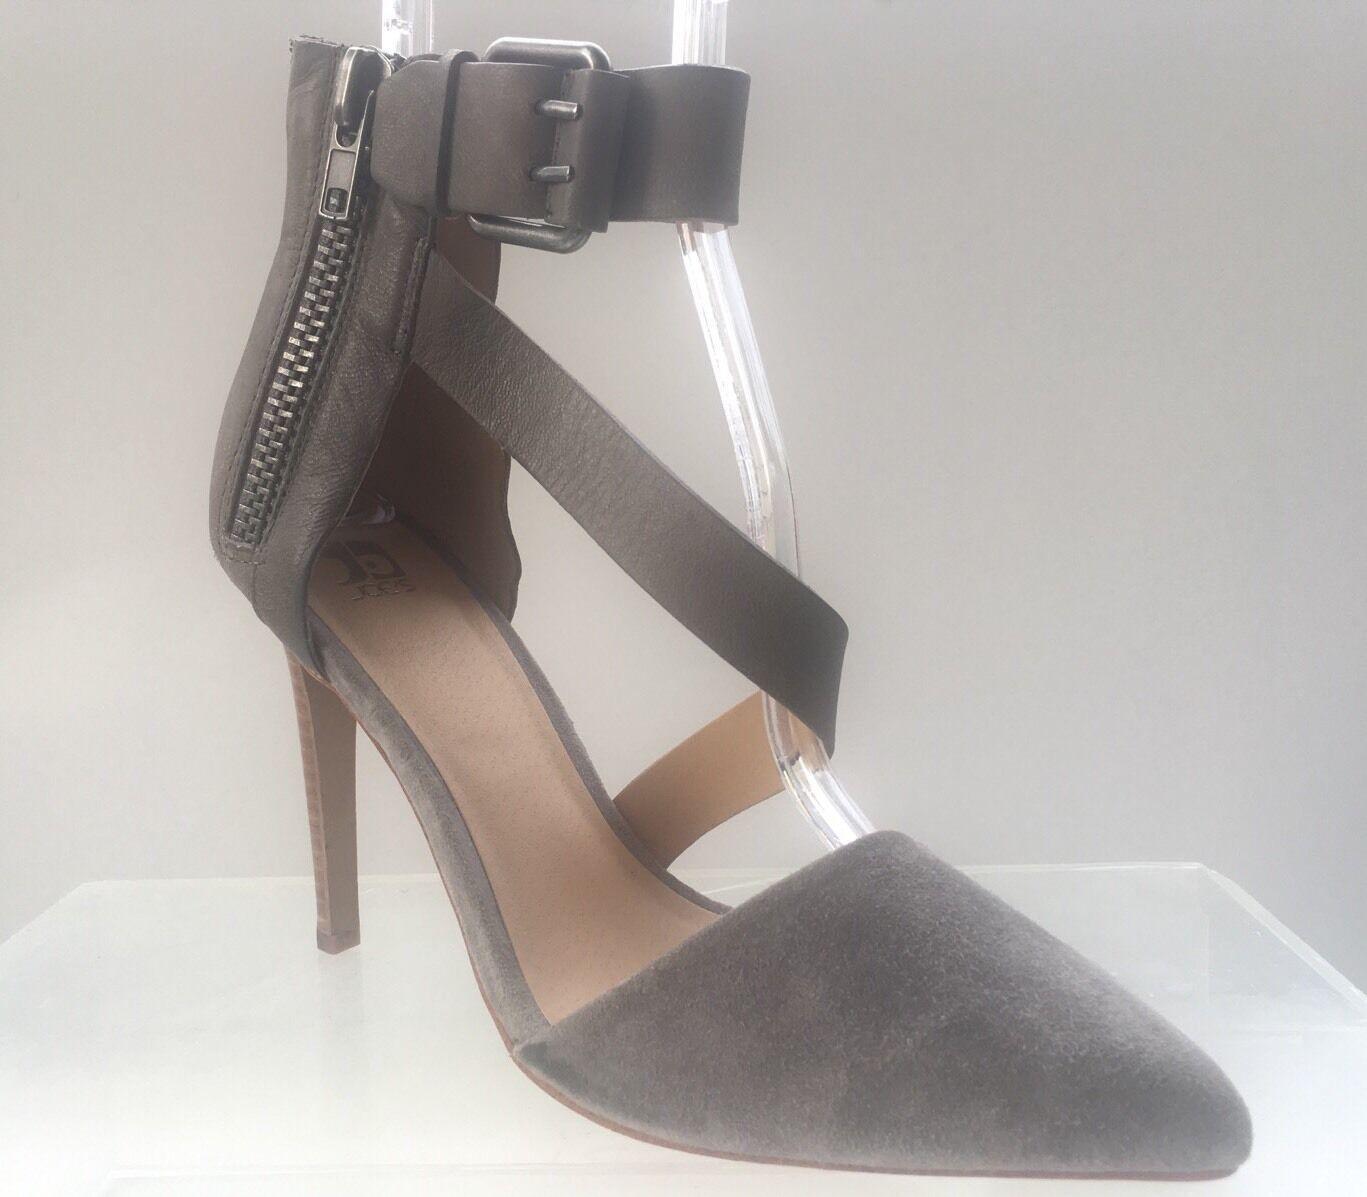 Joe's Ali Pointed Toe Gray Grau Suede Ankle Strap Pump Größe 8.5 Medium NEU